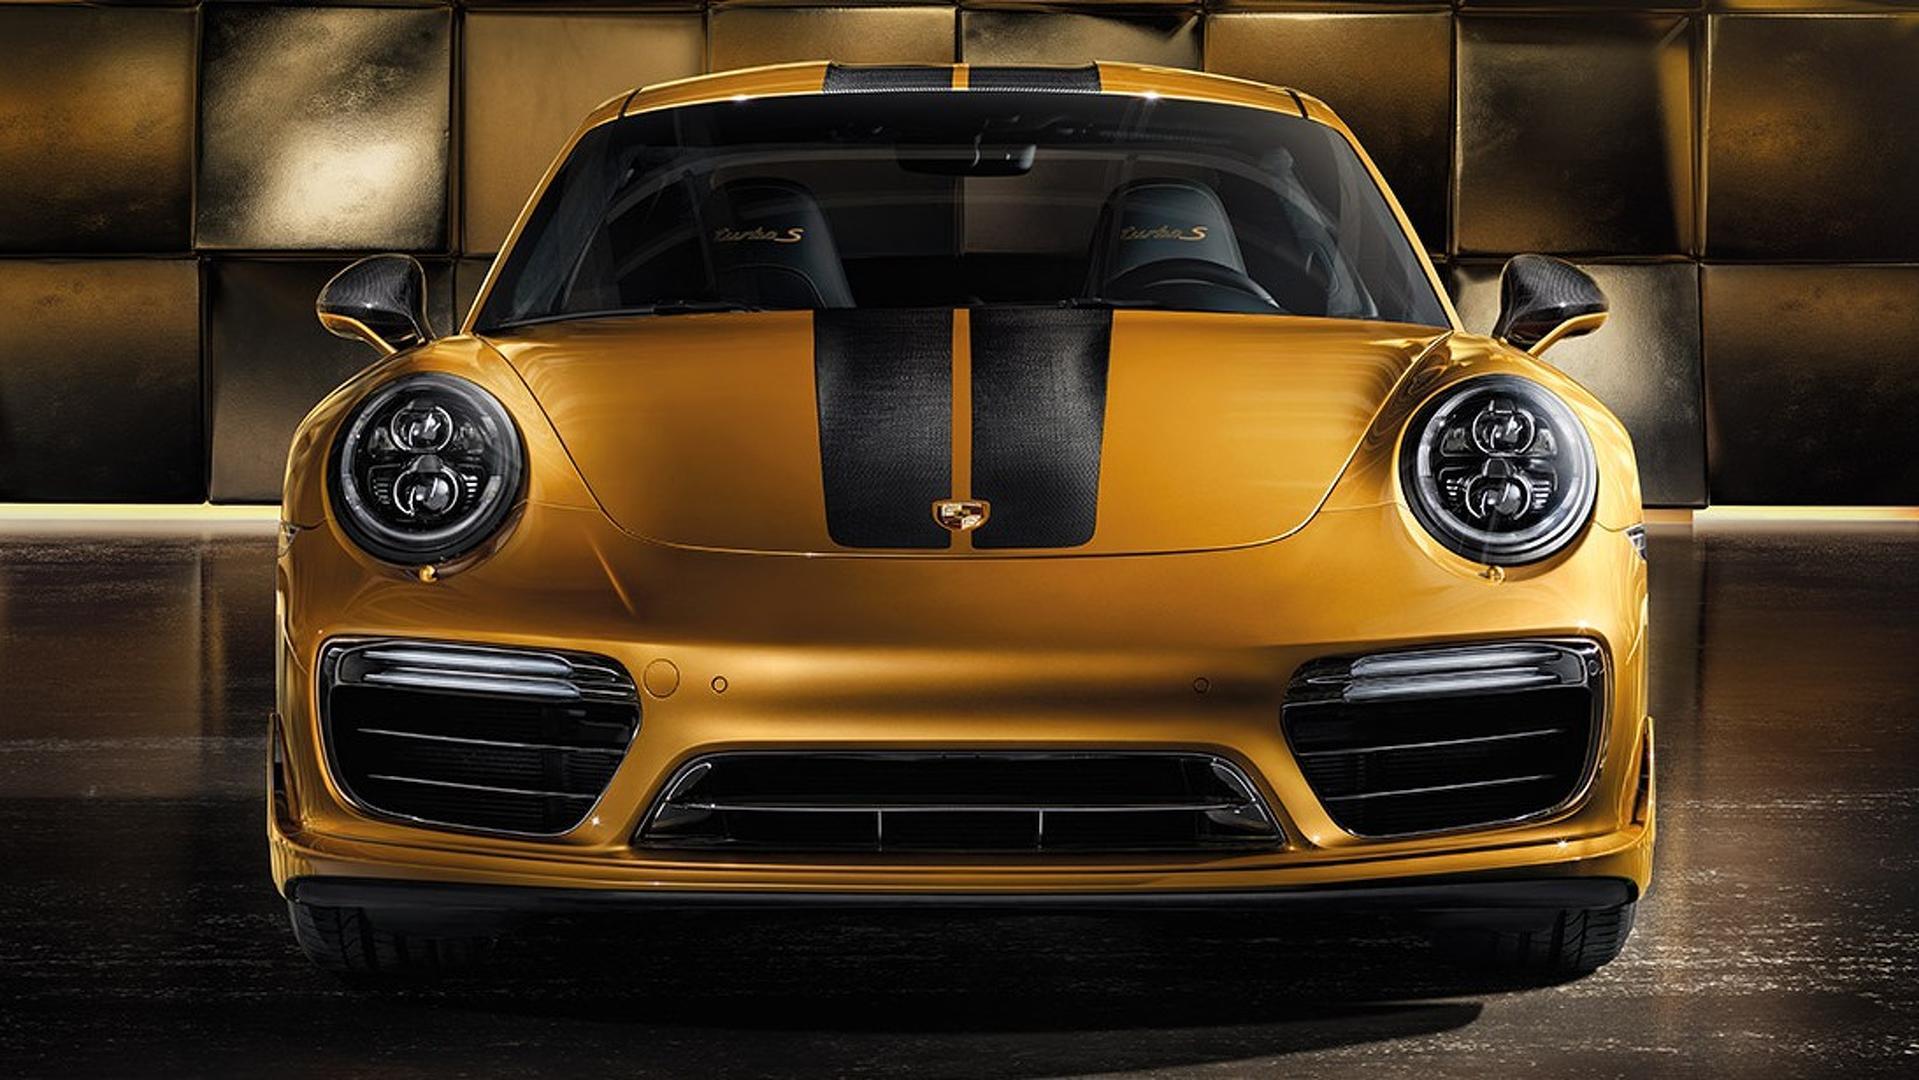 Porsche_911_Turbo_S_Exclusive_Series_03